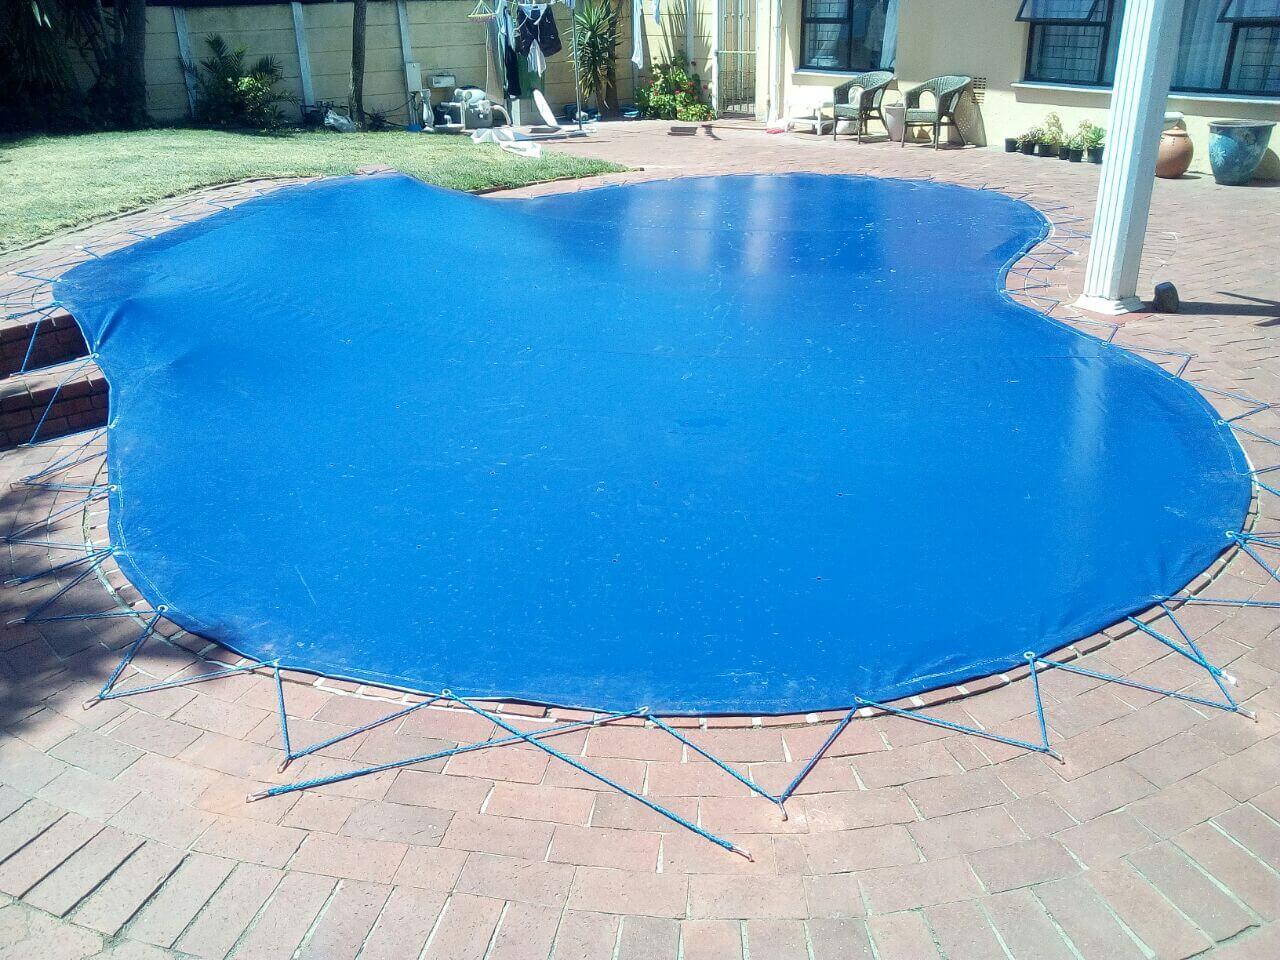 Lace Pool Cover Blue Black Jenna 6 Blinds Exact